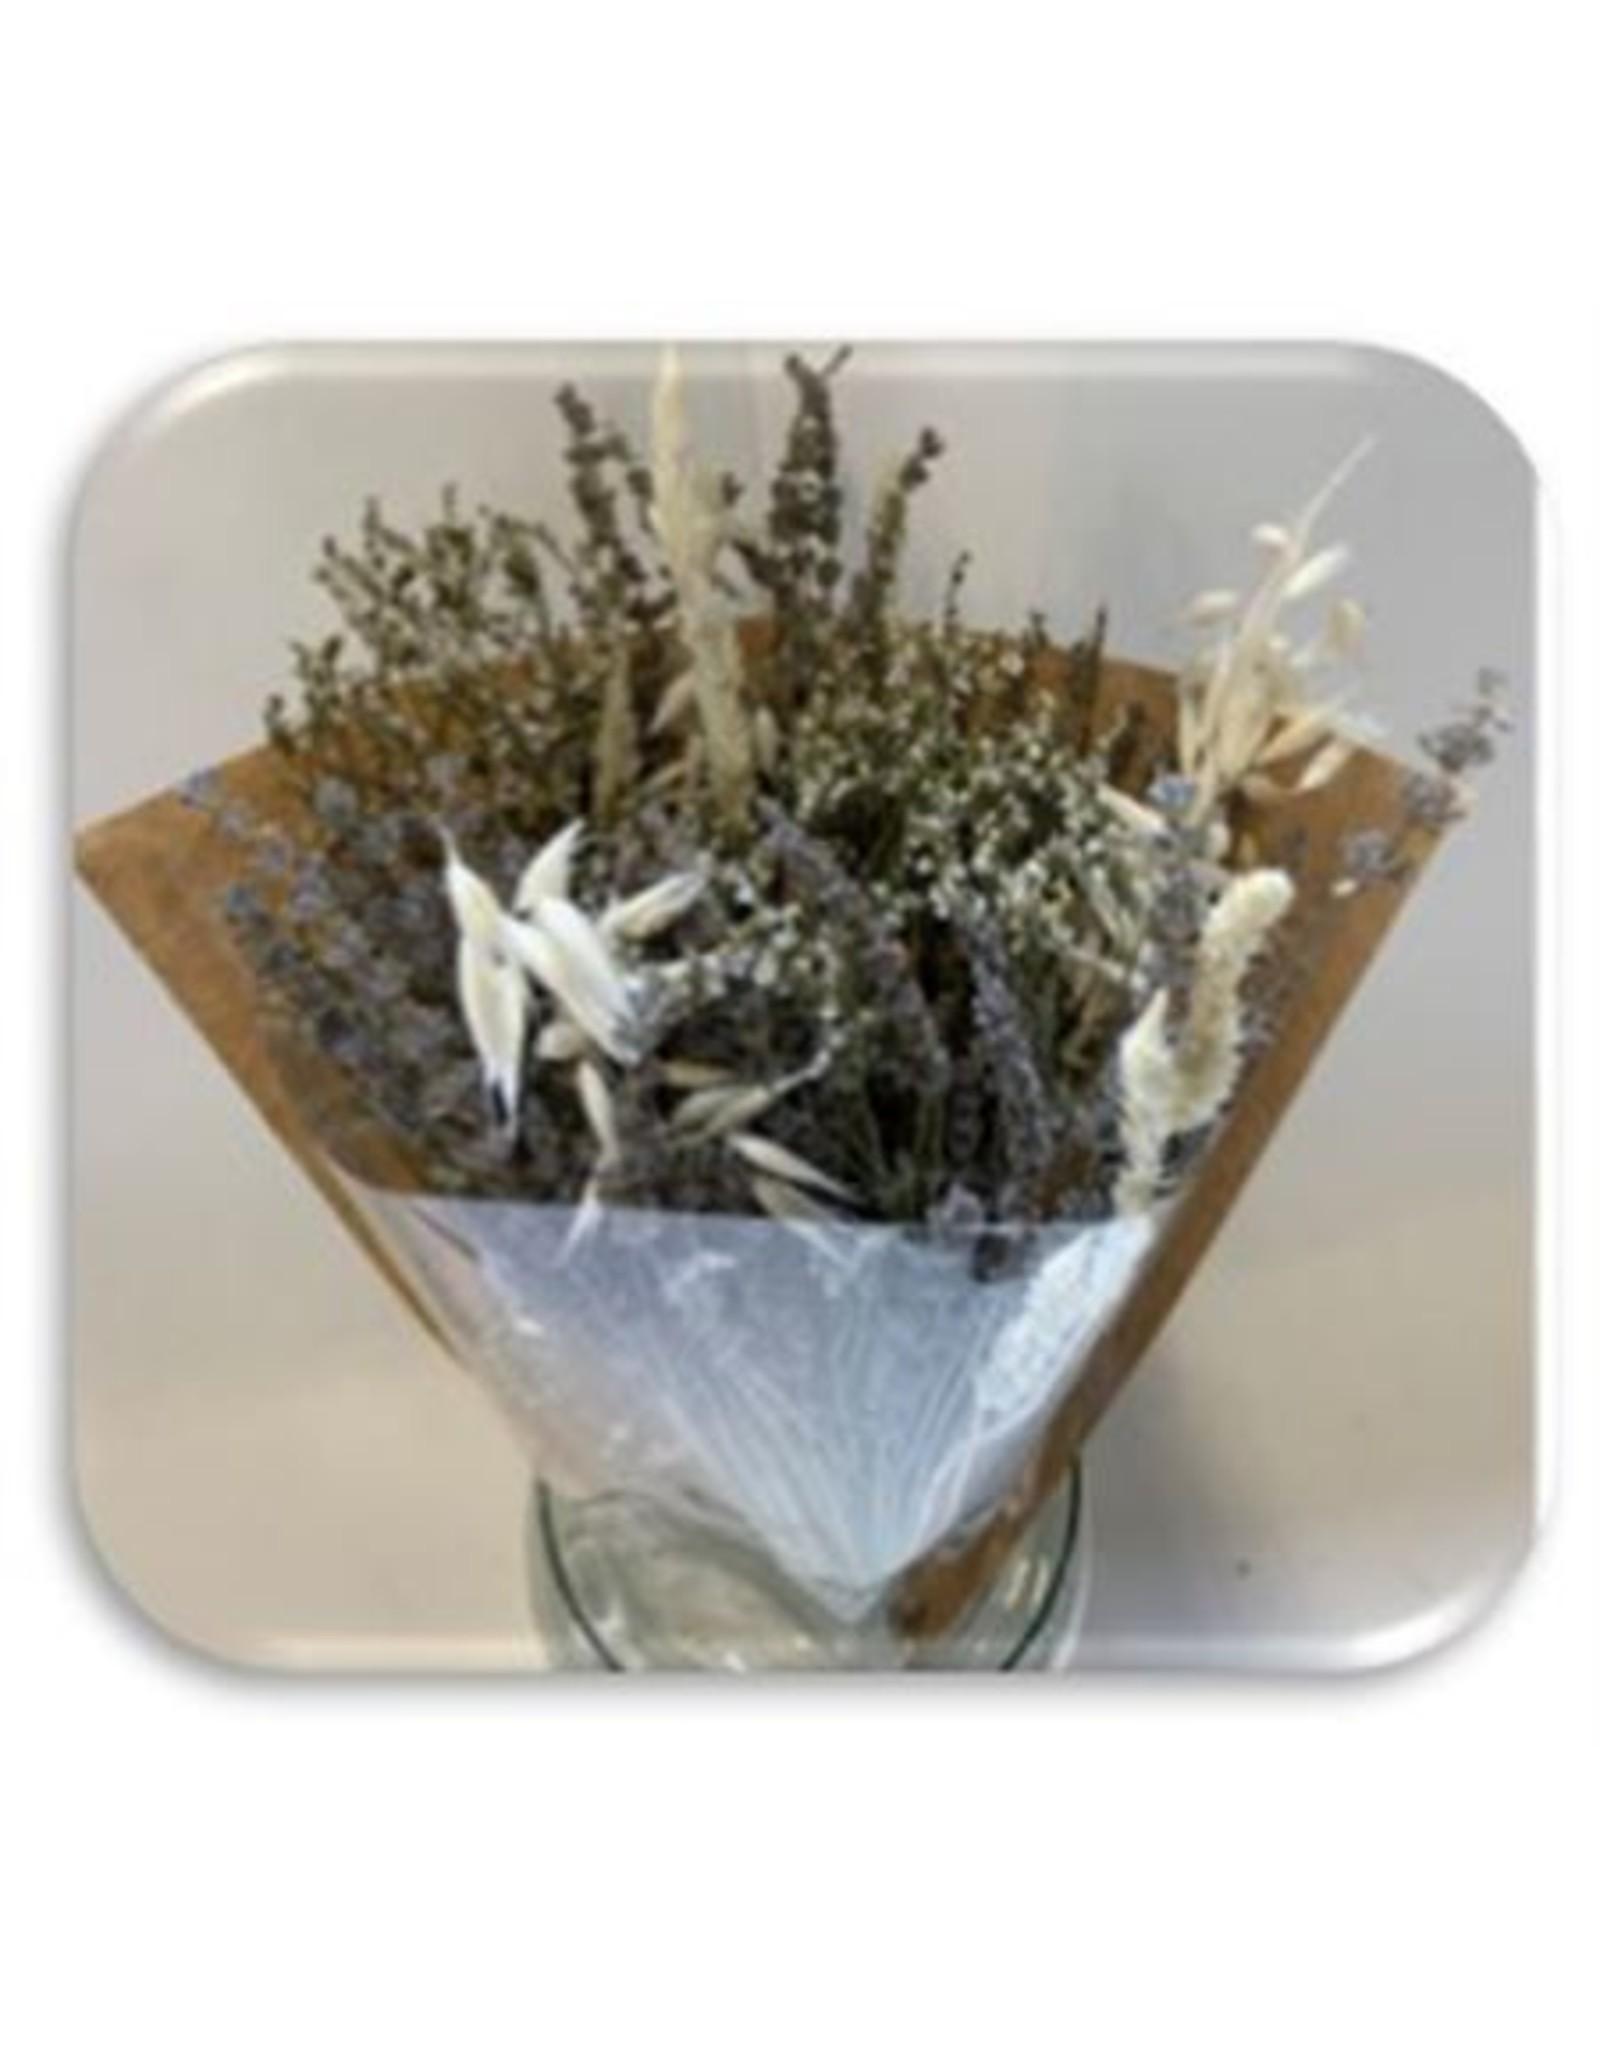 HD Boeket droogbloemen Lavendel Bq2 in hoes ↑50.0 (x 15)